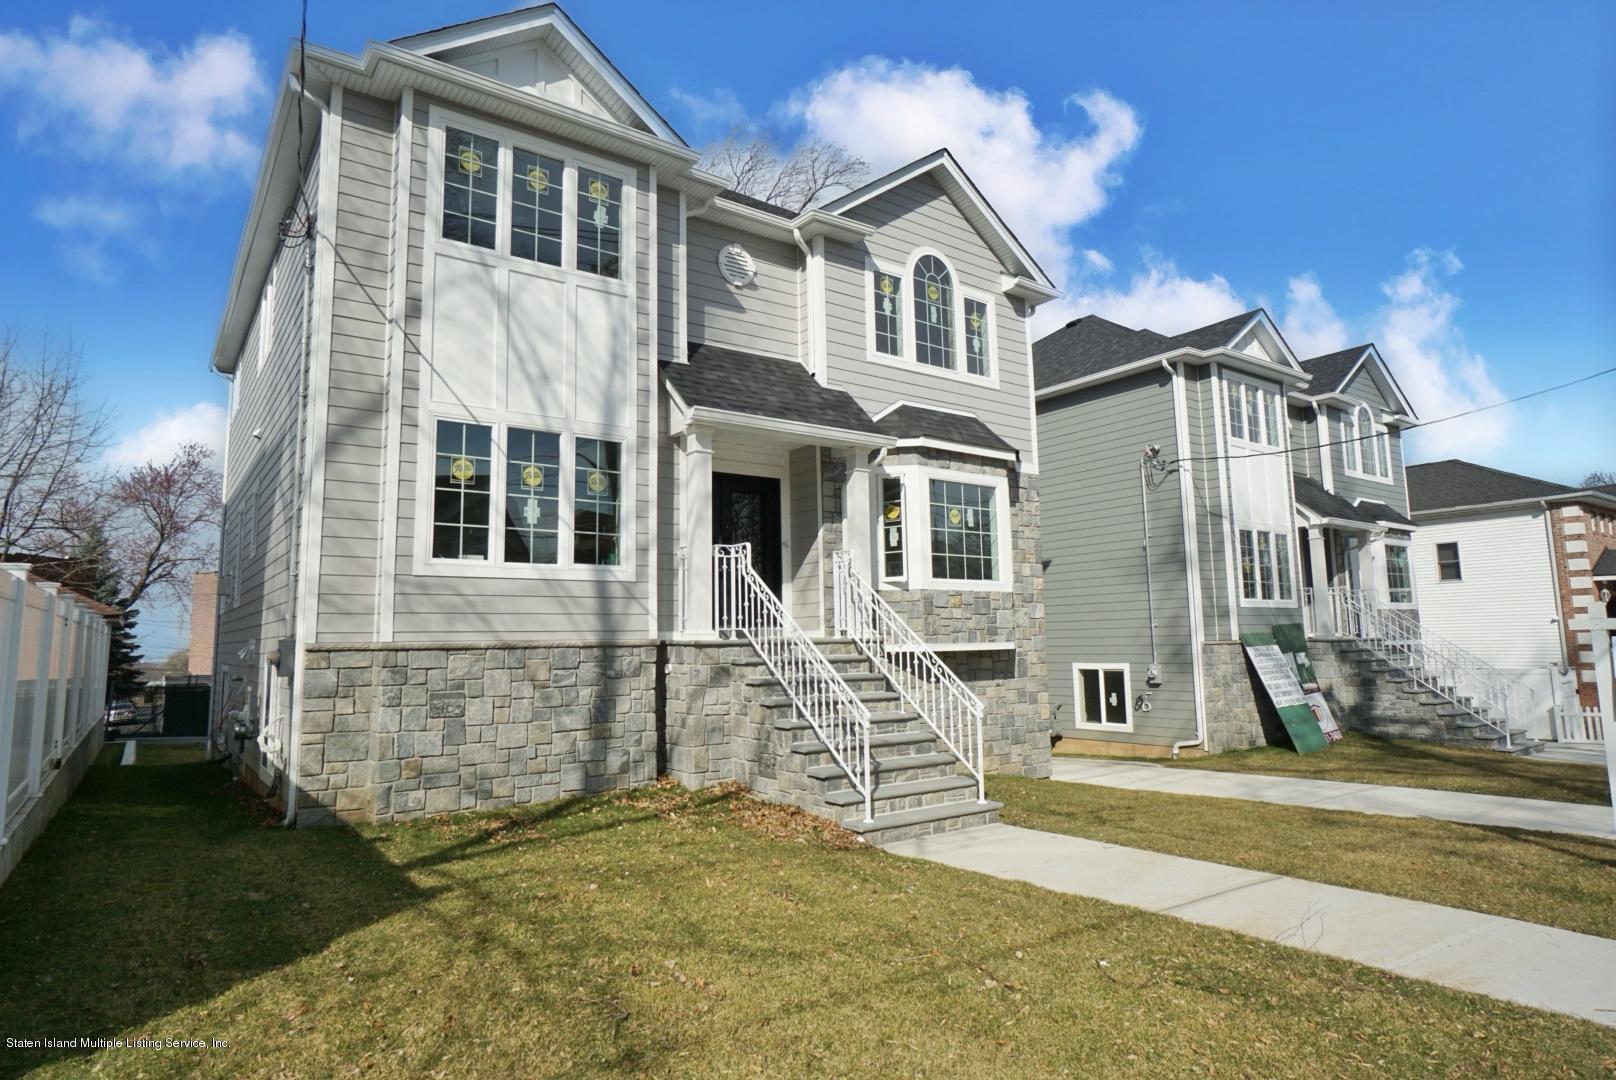 Single Family - Detached 170 Fairview Avenue  Staten Island, NY 10314, MLS-1126684-5